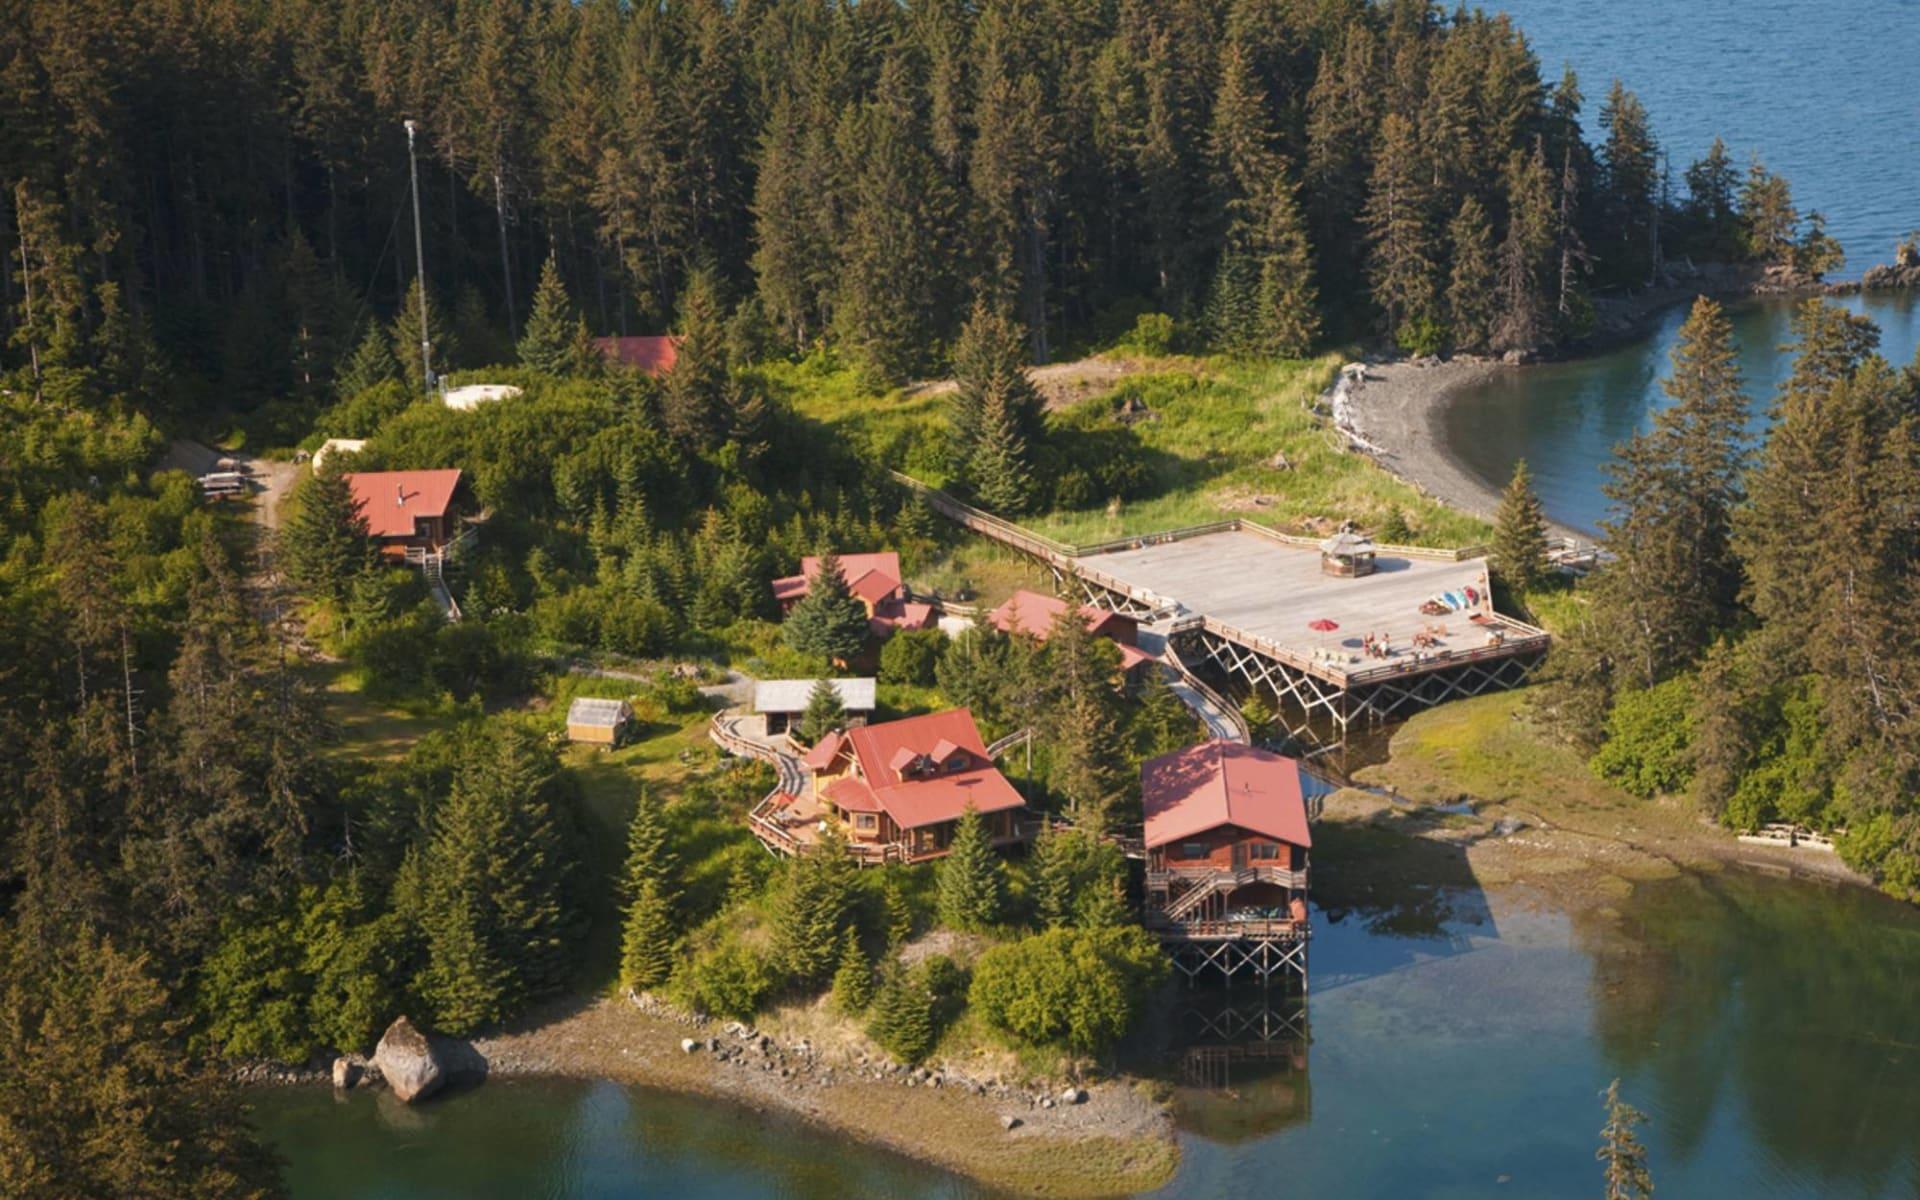 Tutka Bay Lodge in Homer:  2011_083_03_tutka bay wilderness lodge_1